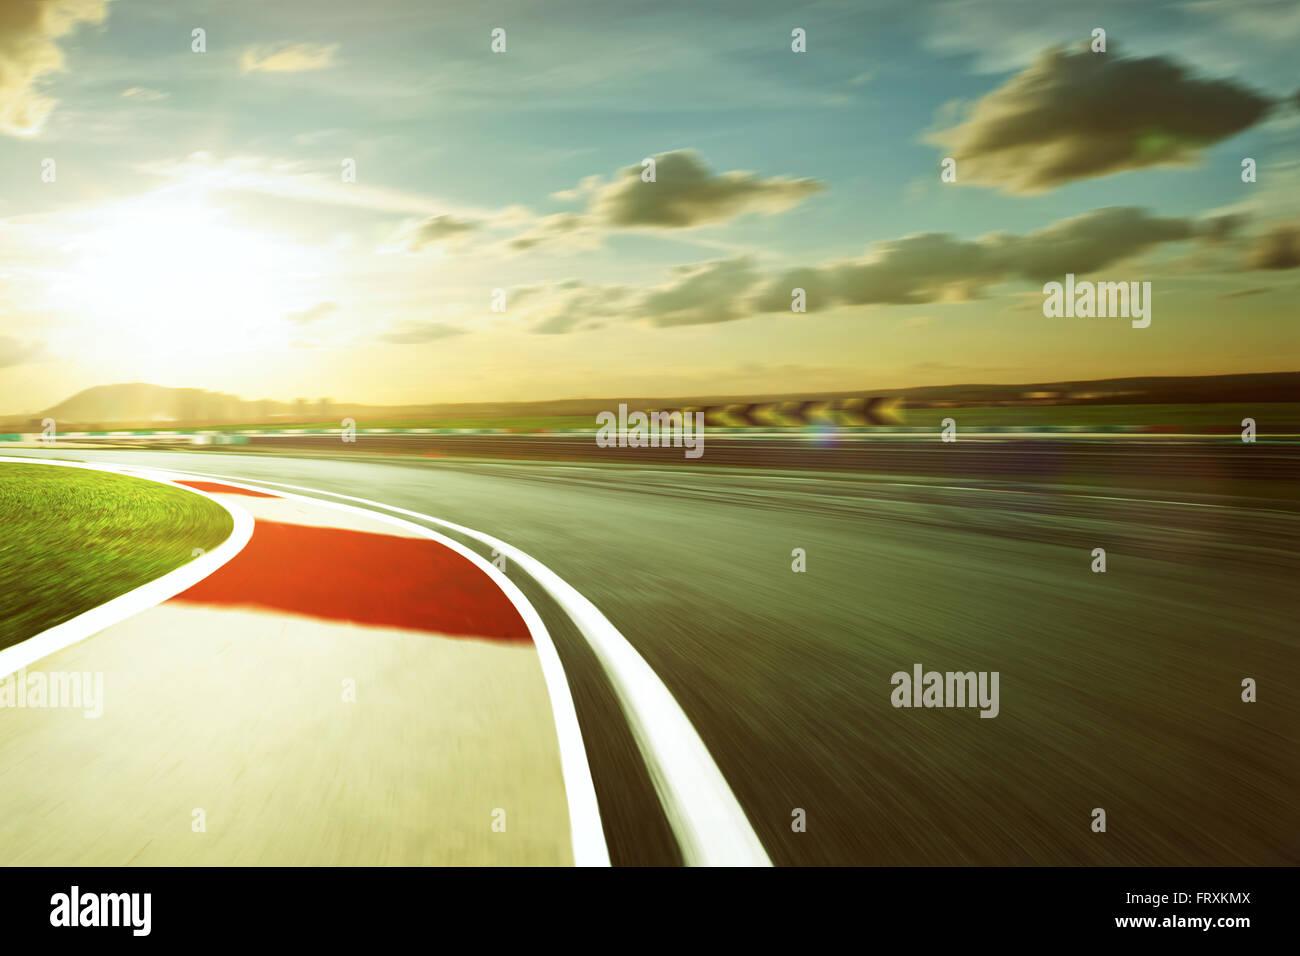 Motion blurred racetrack,vintage mood mood - Stock Image